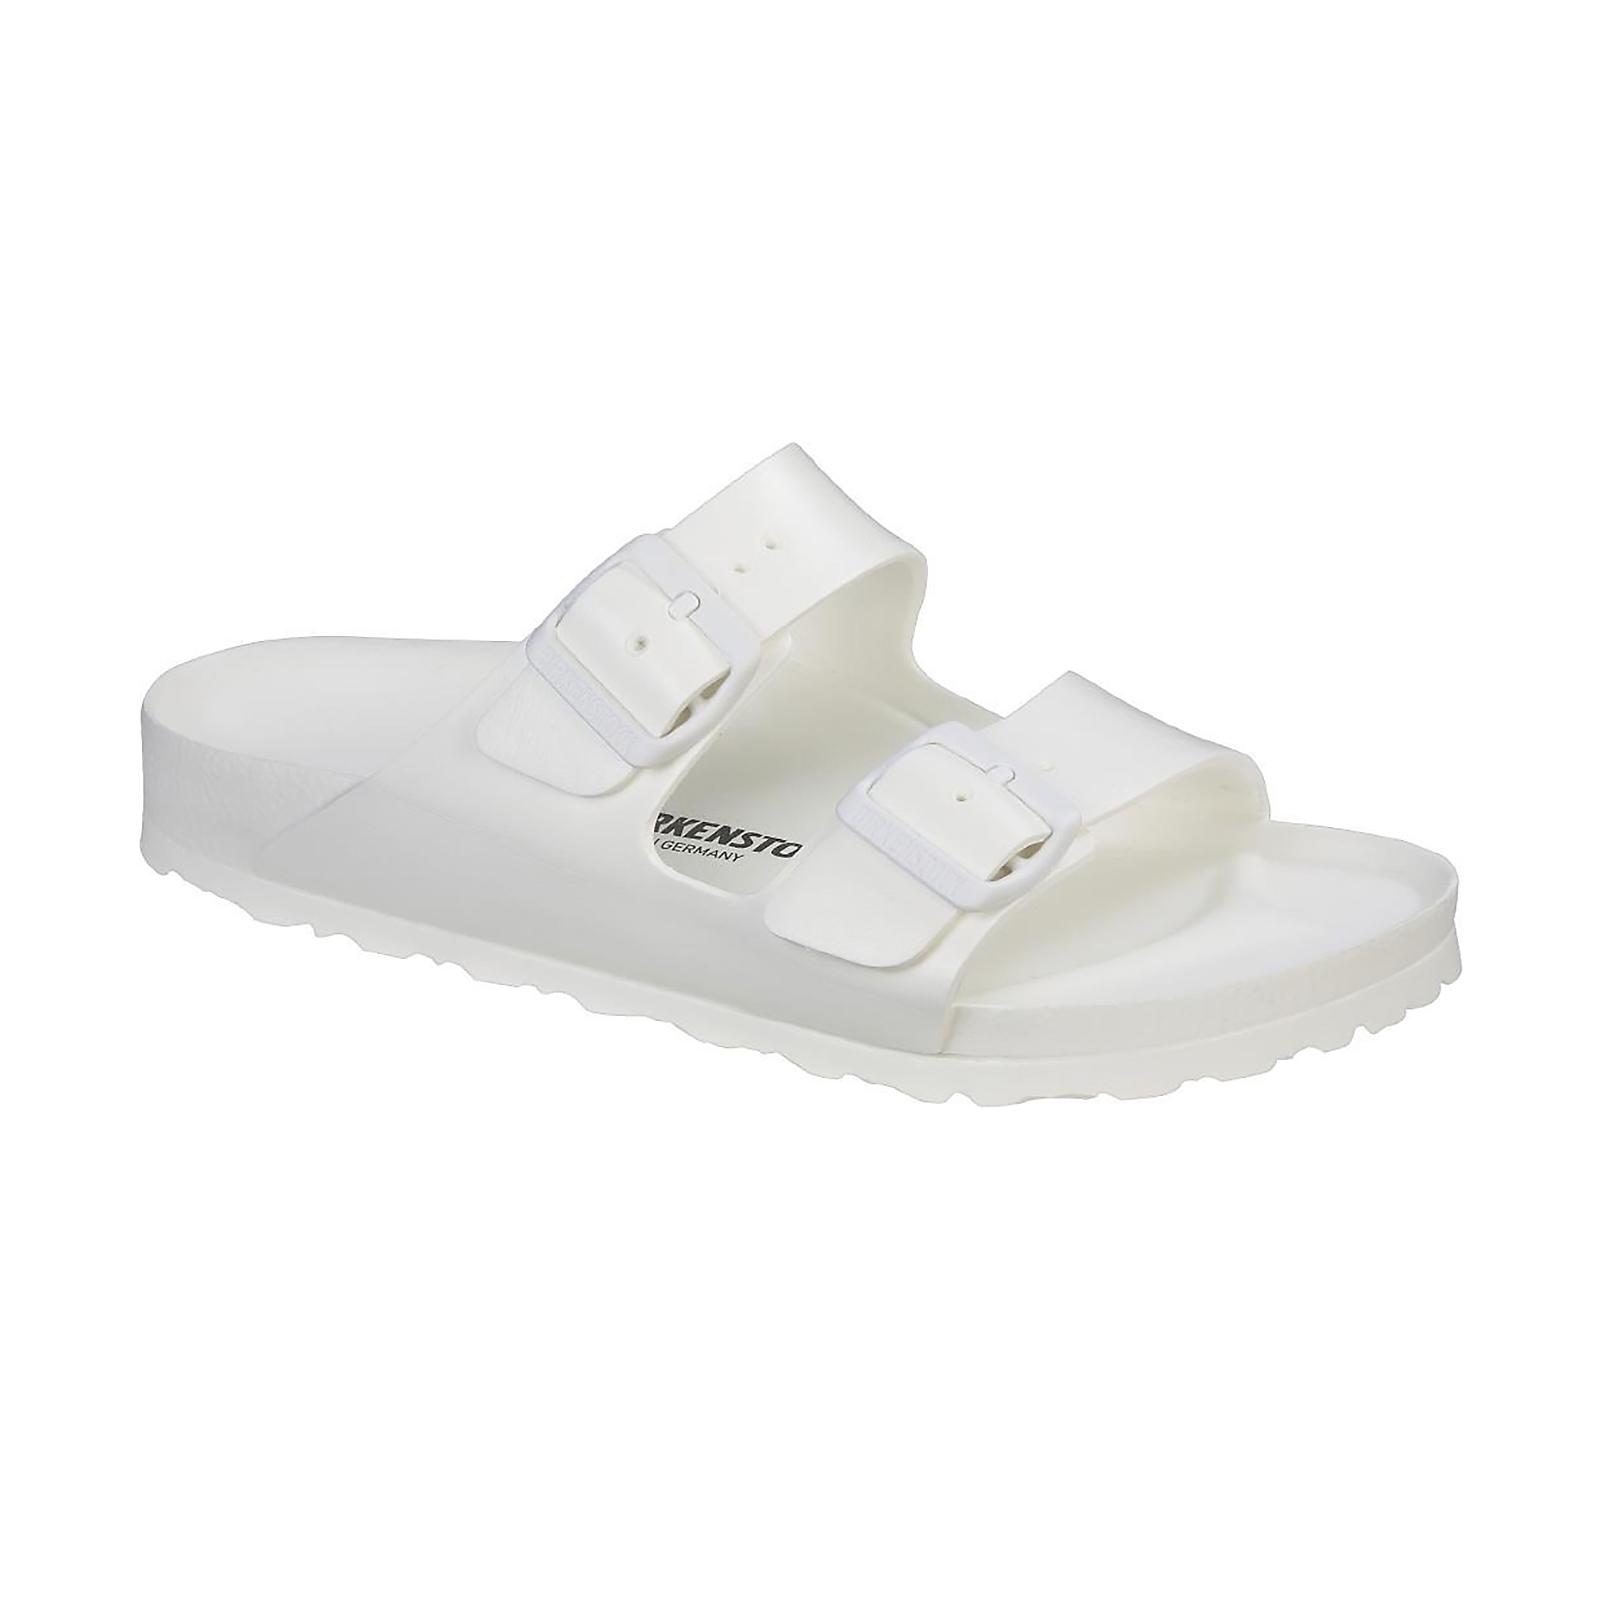 b86e61d9784411 Birkenstock Sandals Unisex Arizona Weiss Eva Fitting Normal